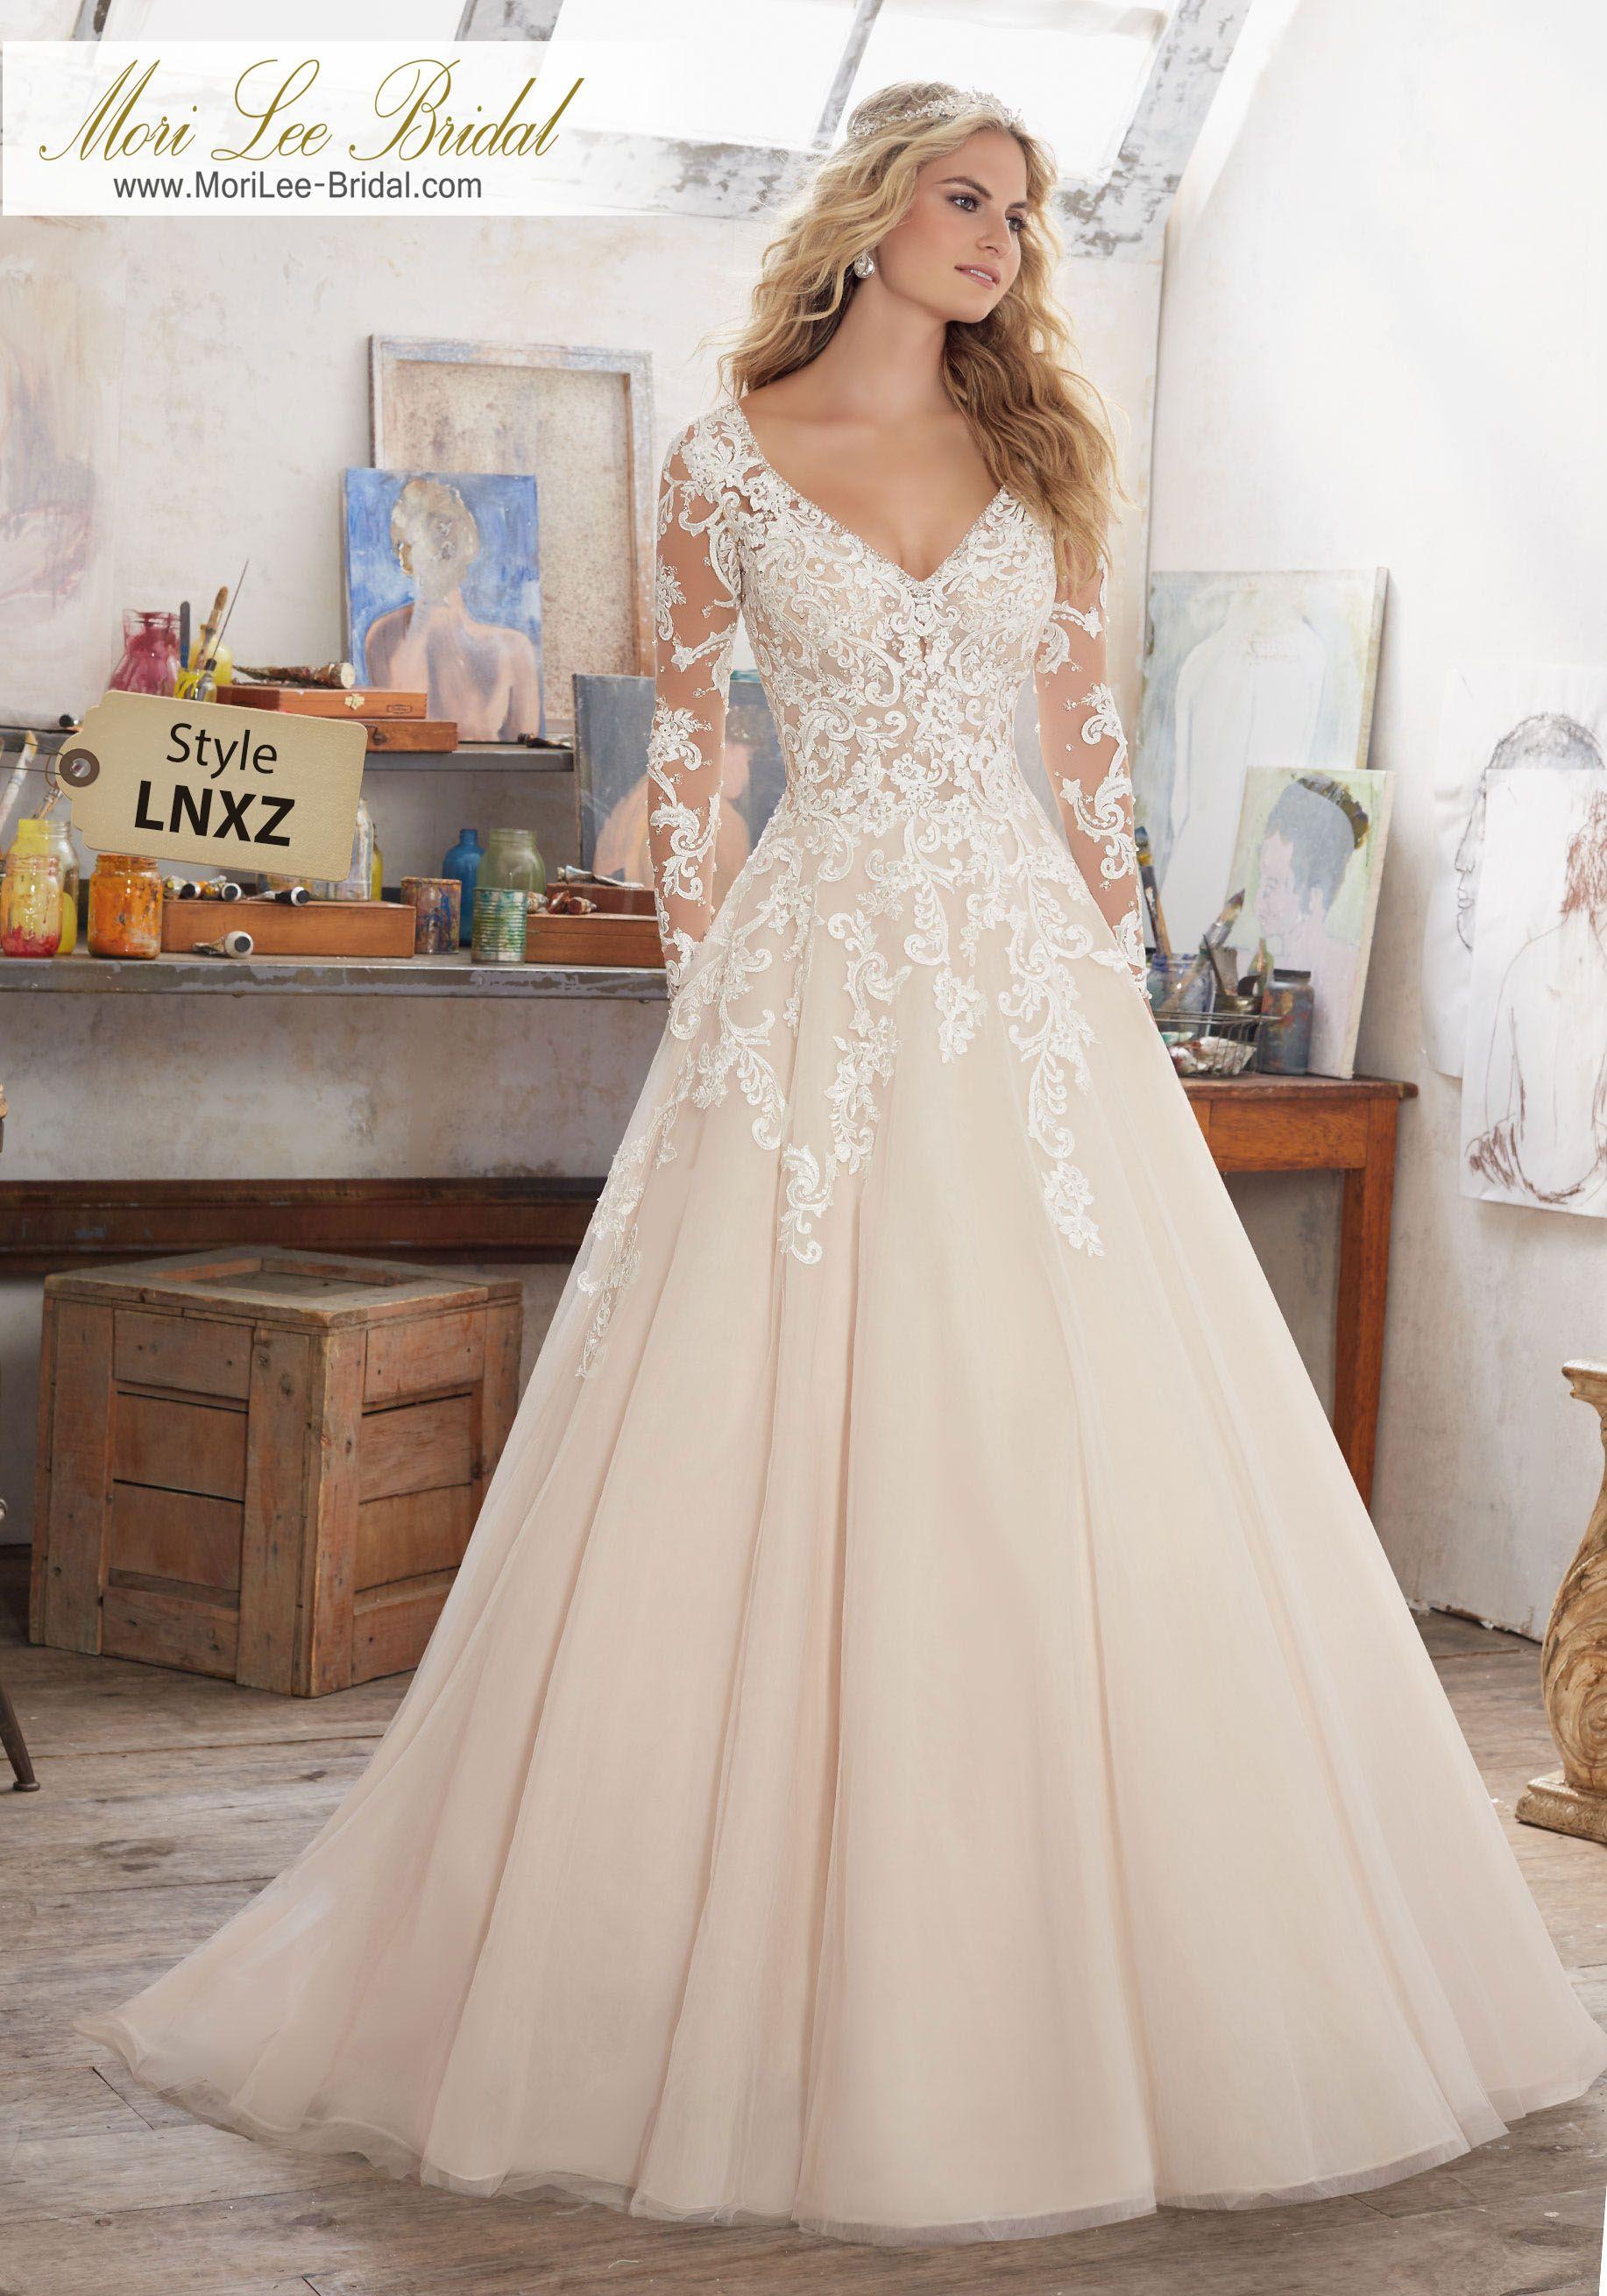 Style lnxz maira wedding dress long sleeve wedding dress featuring